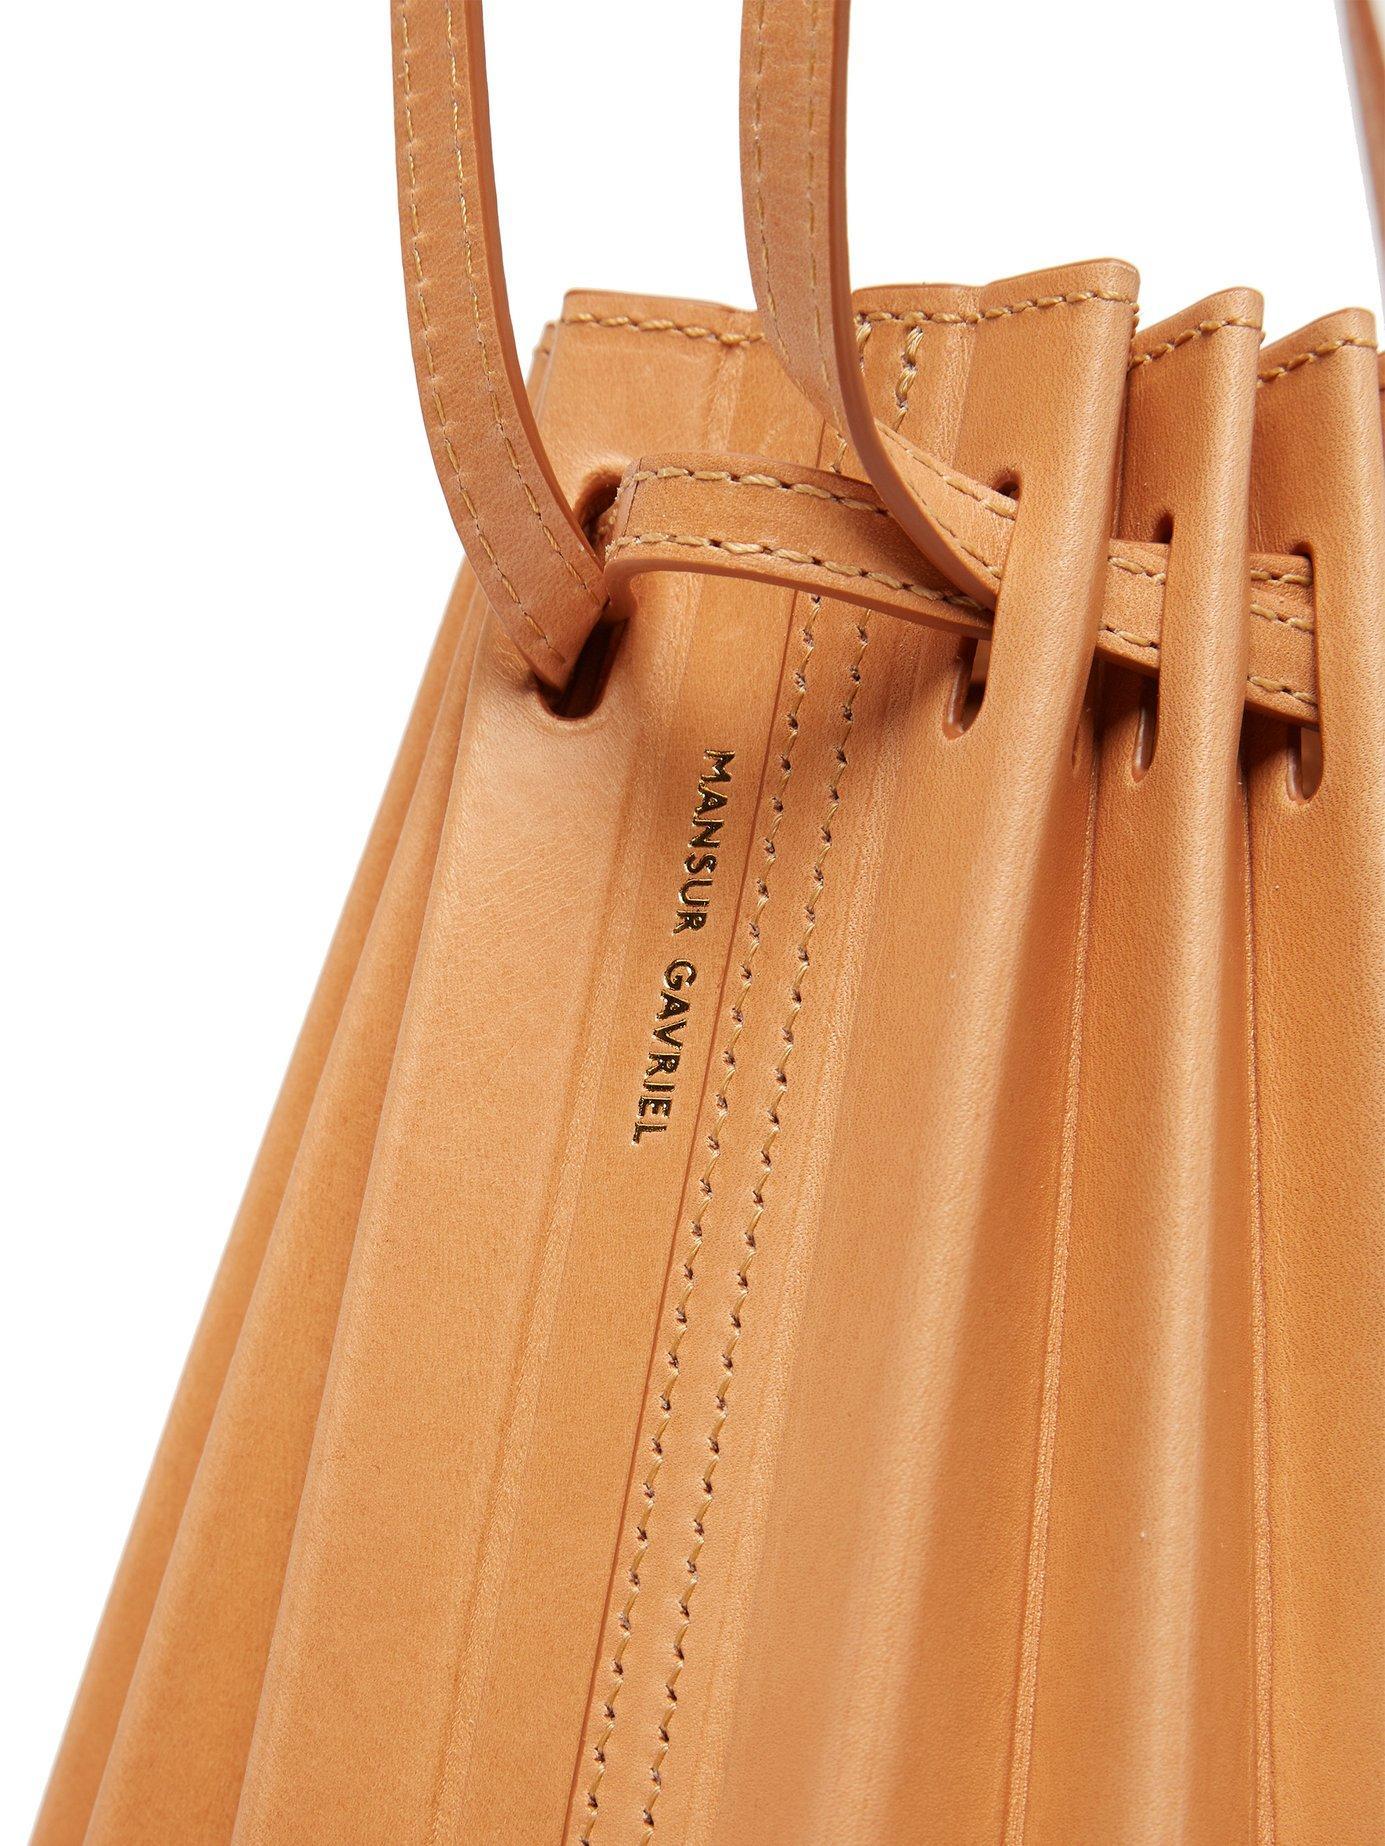 0b75d0d1f Mansur Gavriel Vegetable Tanned Pleated Italian Leather Bucket Bag ...